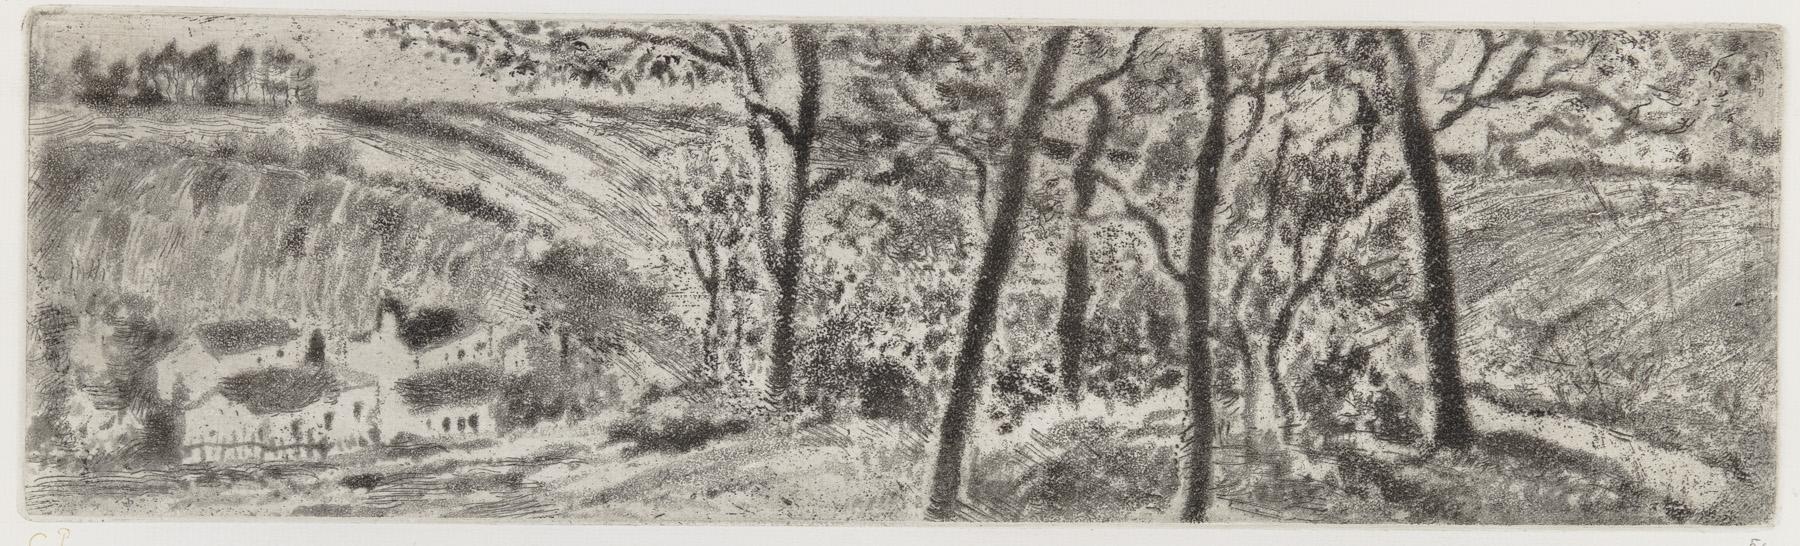 Paysage En Long (landscape Panorama) by Camille Pissarro